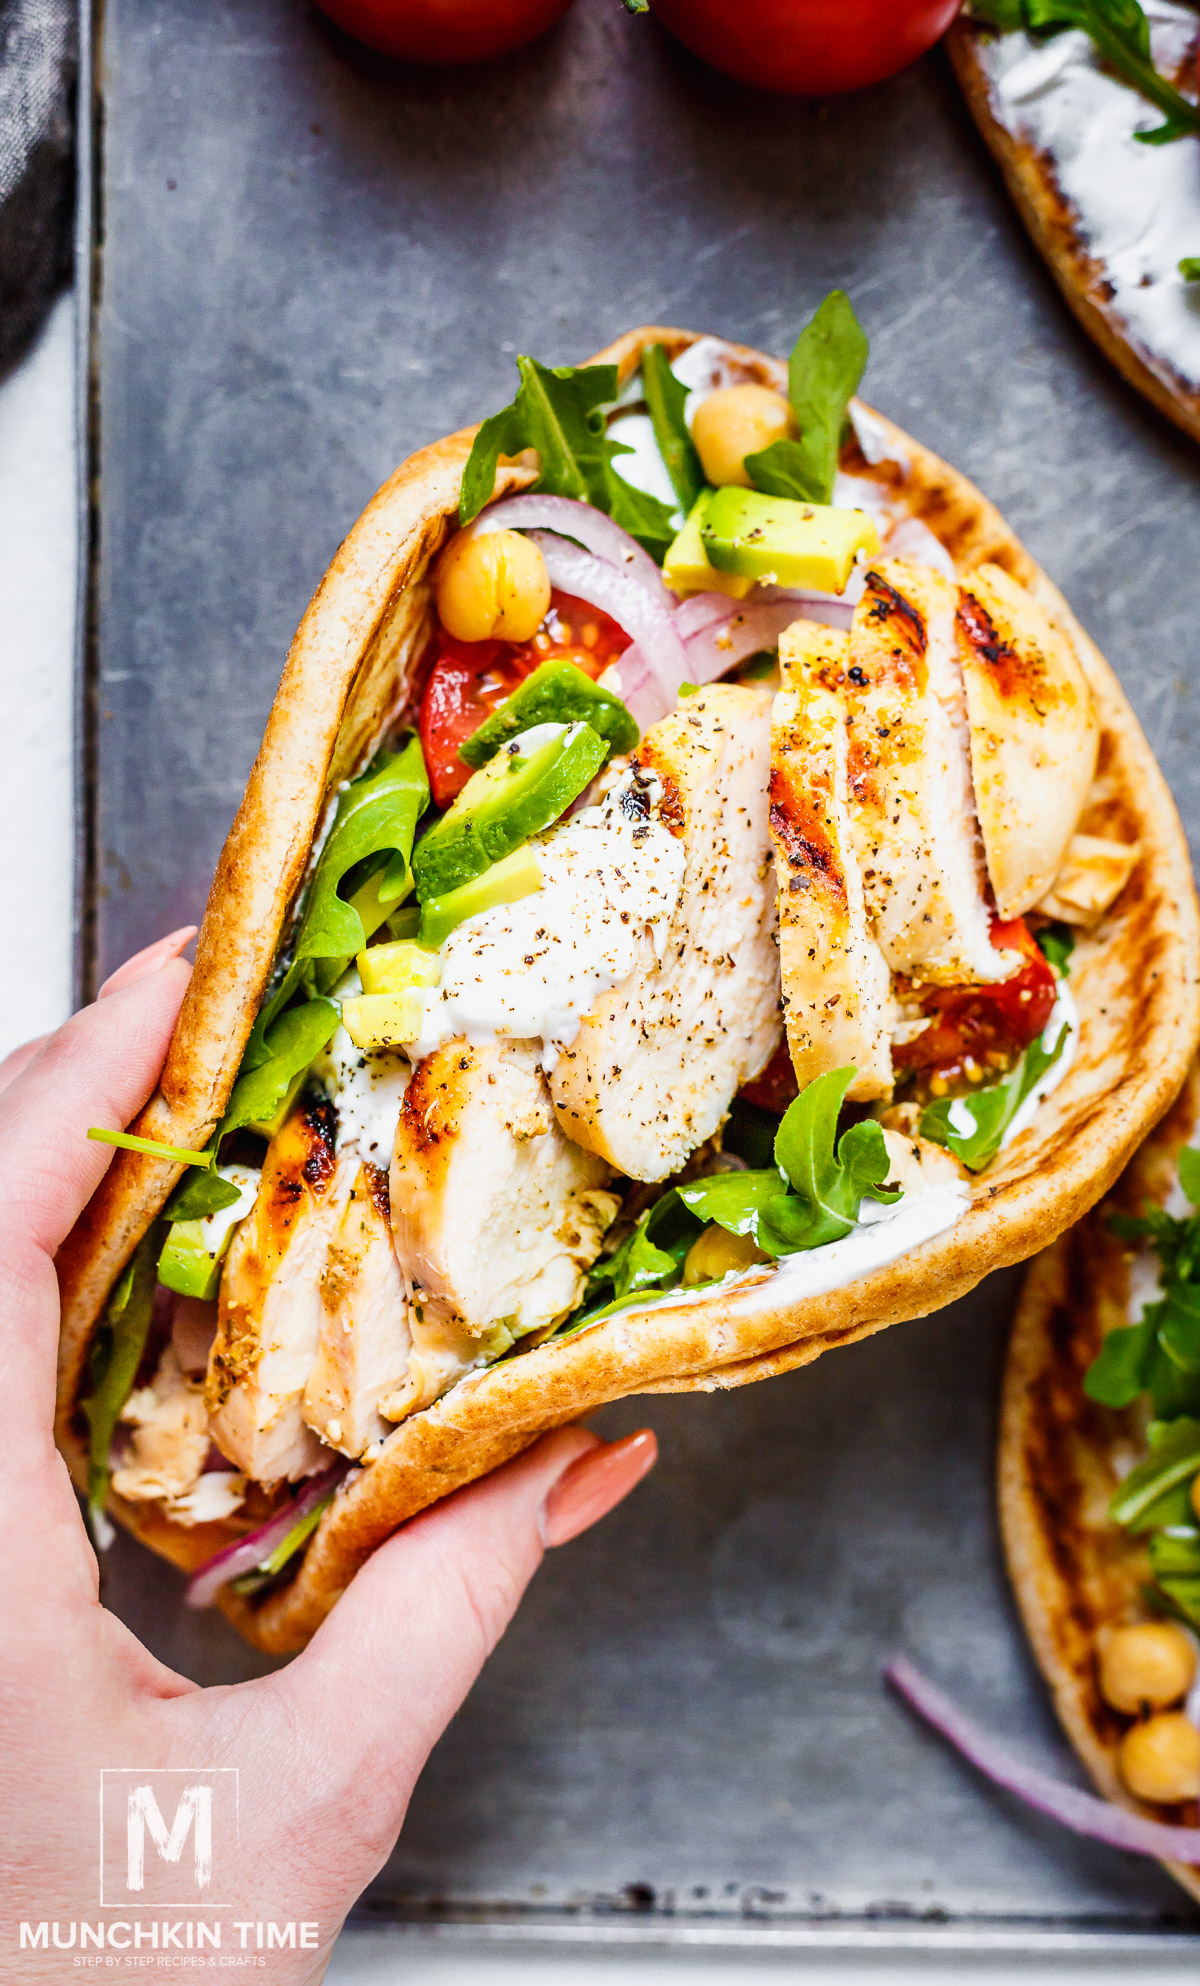 Quick Easy Delicious Dinner Ideas